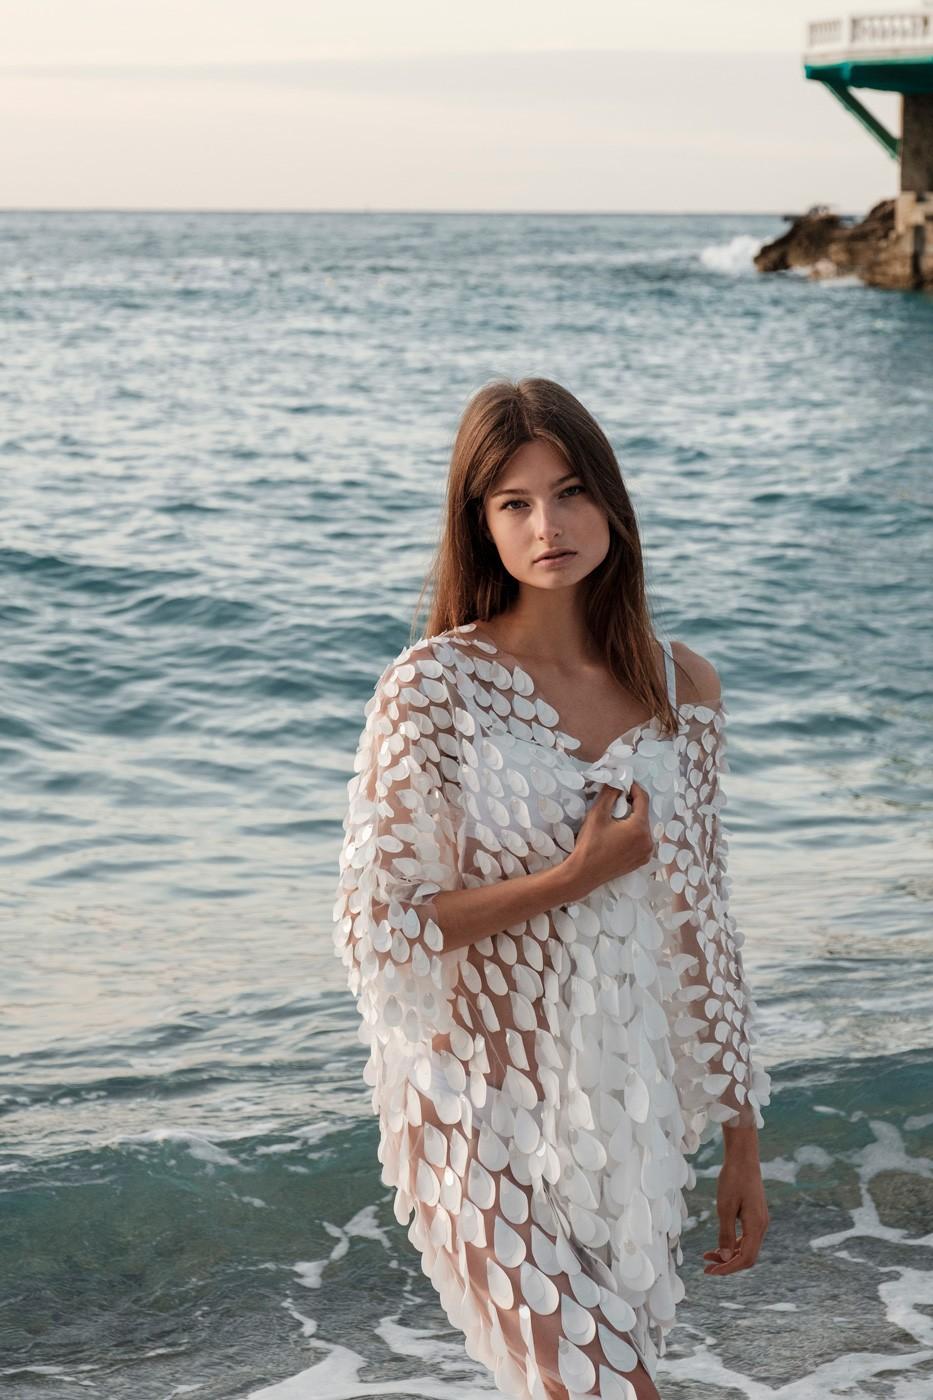 ELISA_NESS_Collection_2020_Oceane_06